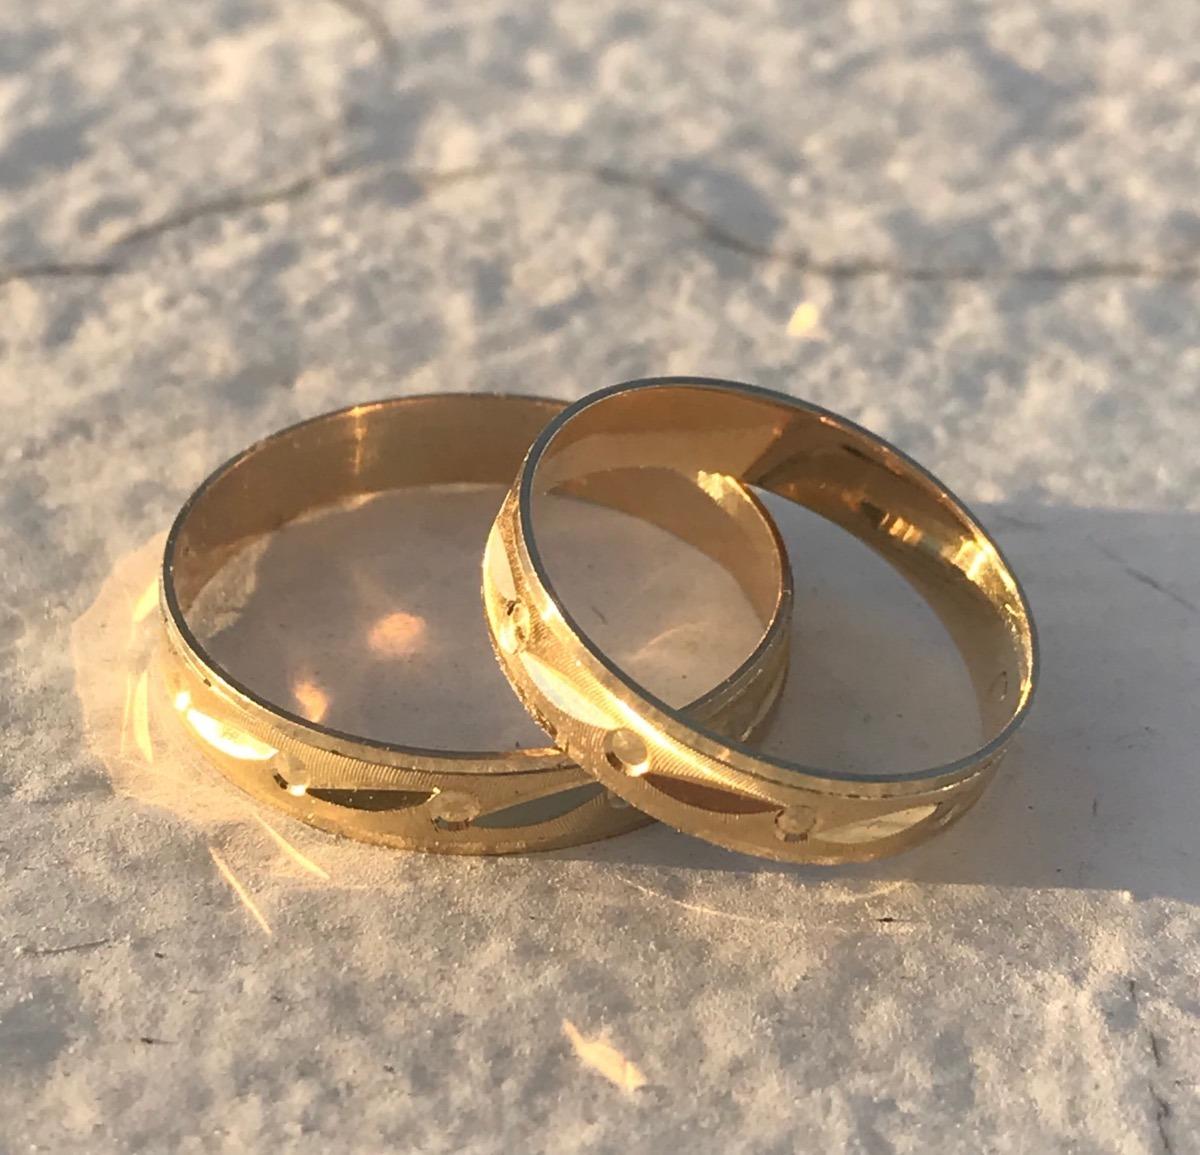 66a3fec65be4 anillos par argollas matrimonio boda oro 10 k oferta! Cargando zoom.